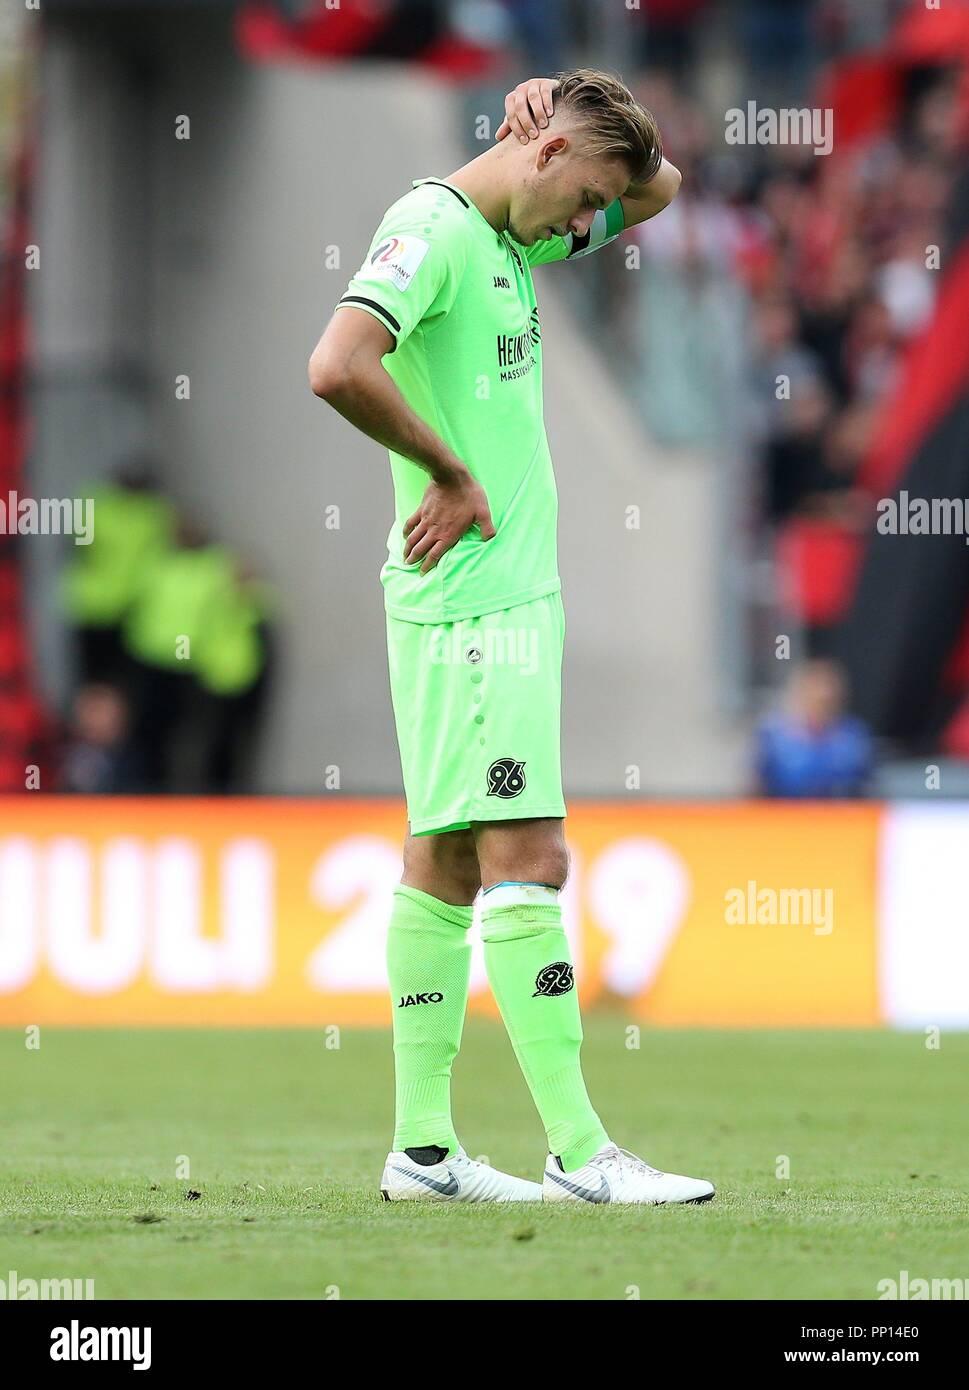 firo: 22.09.2018 Fuvuball, Football: 1.Bundesliga 1.FC Nvrnberg - Hanover 96, Waldemar Anton, Hannover, full figure, gesture, disappointment | usage worldwide Stock Photo